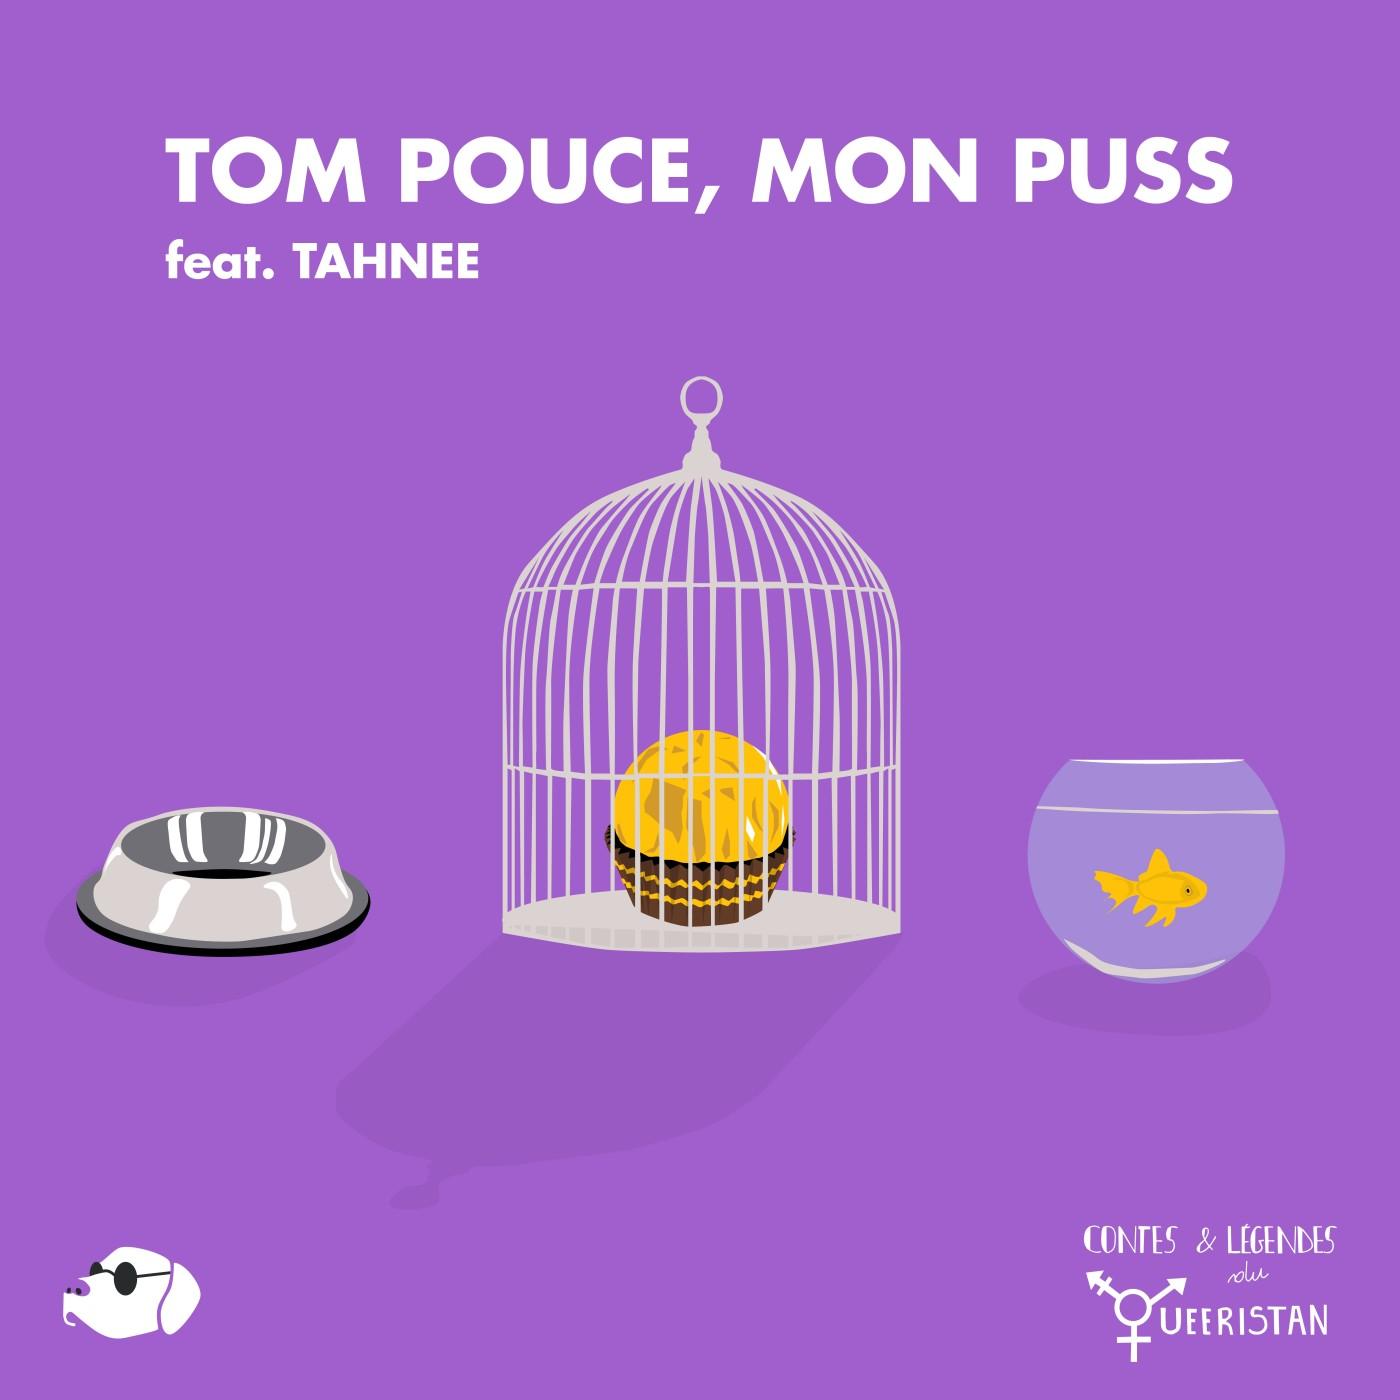 🍄Tom Pouce, mon puss (feat. TAHNEE)